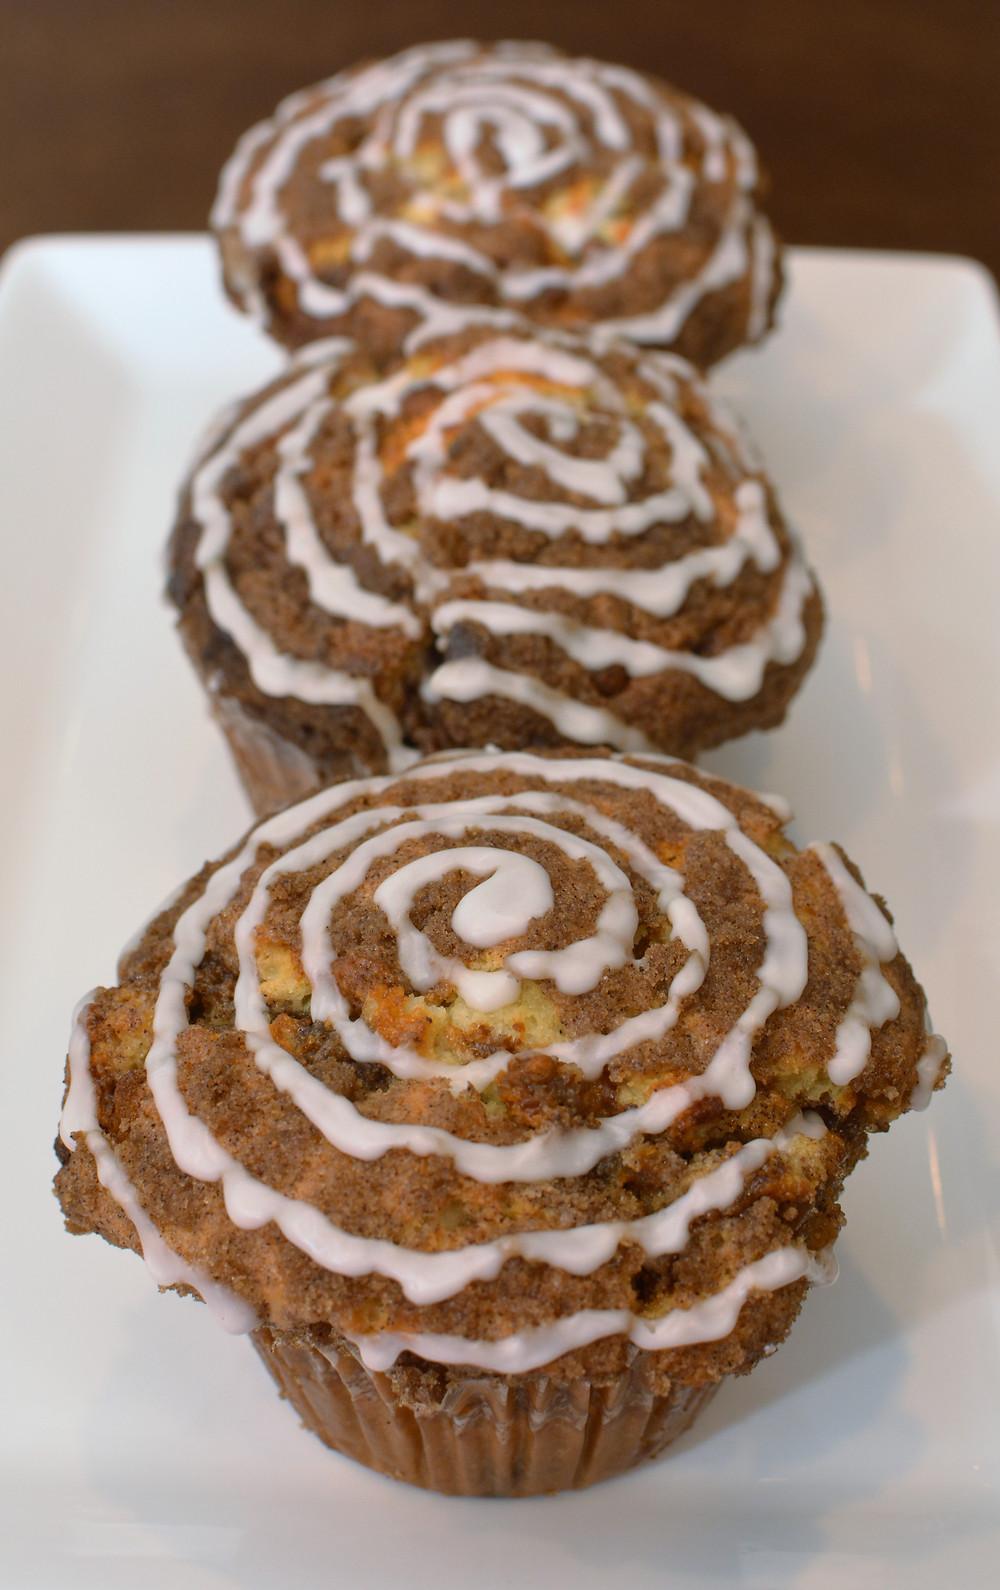 Cinnamon Roll Muffins with Brown Sugar Cinnamon Crumble